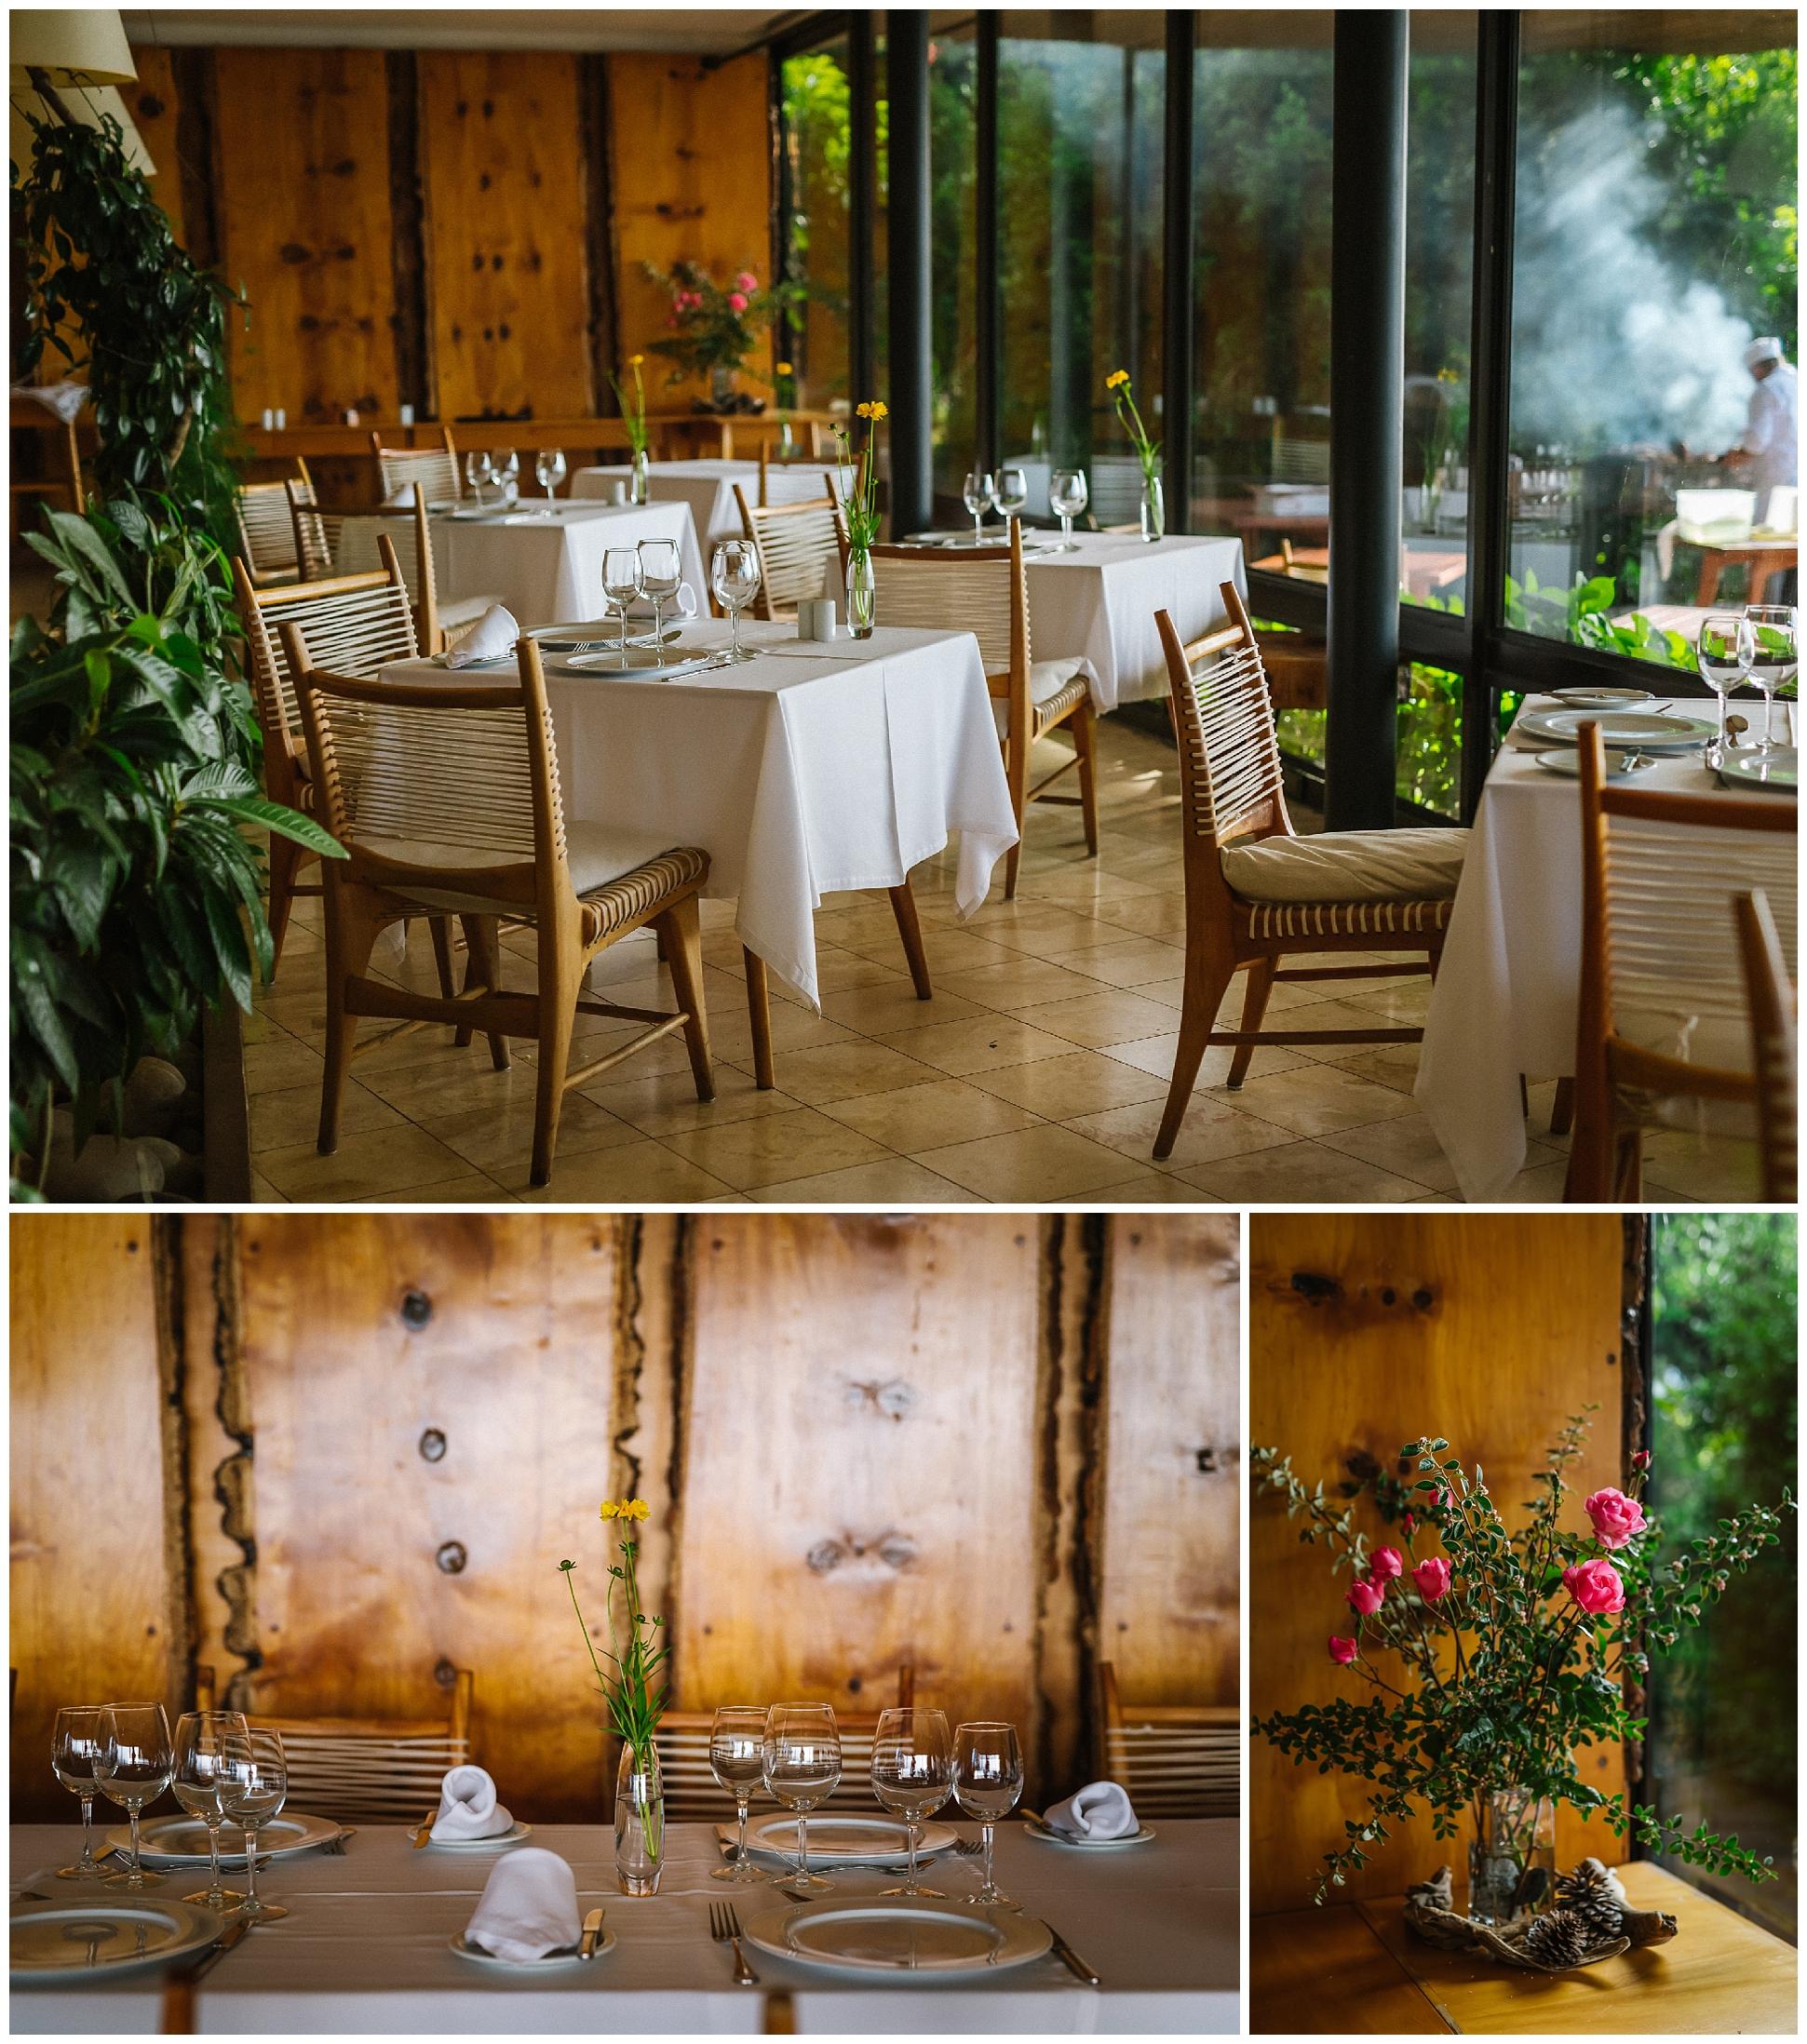 Cheilean-destination-adventure-wedding-florida-patagonia-pucon-santa-cruz-vsco_0014.jpg